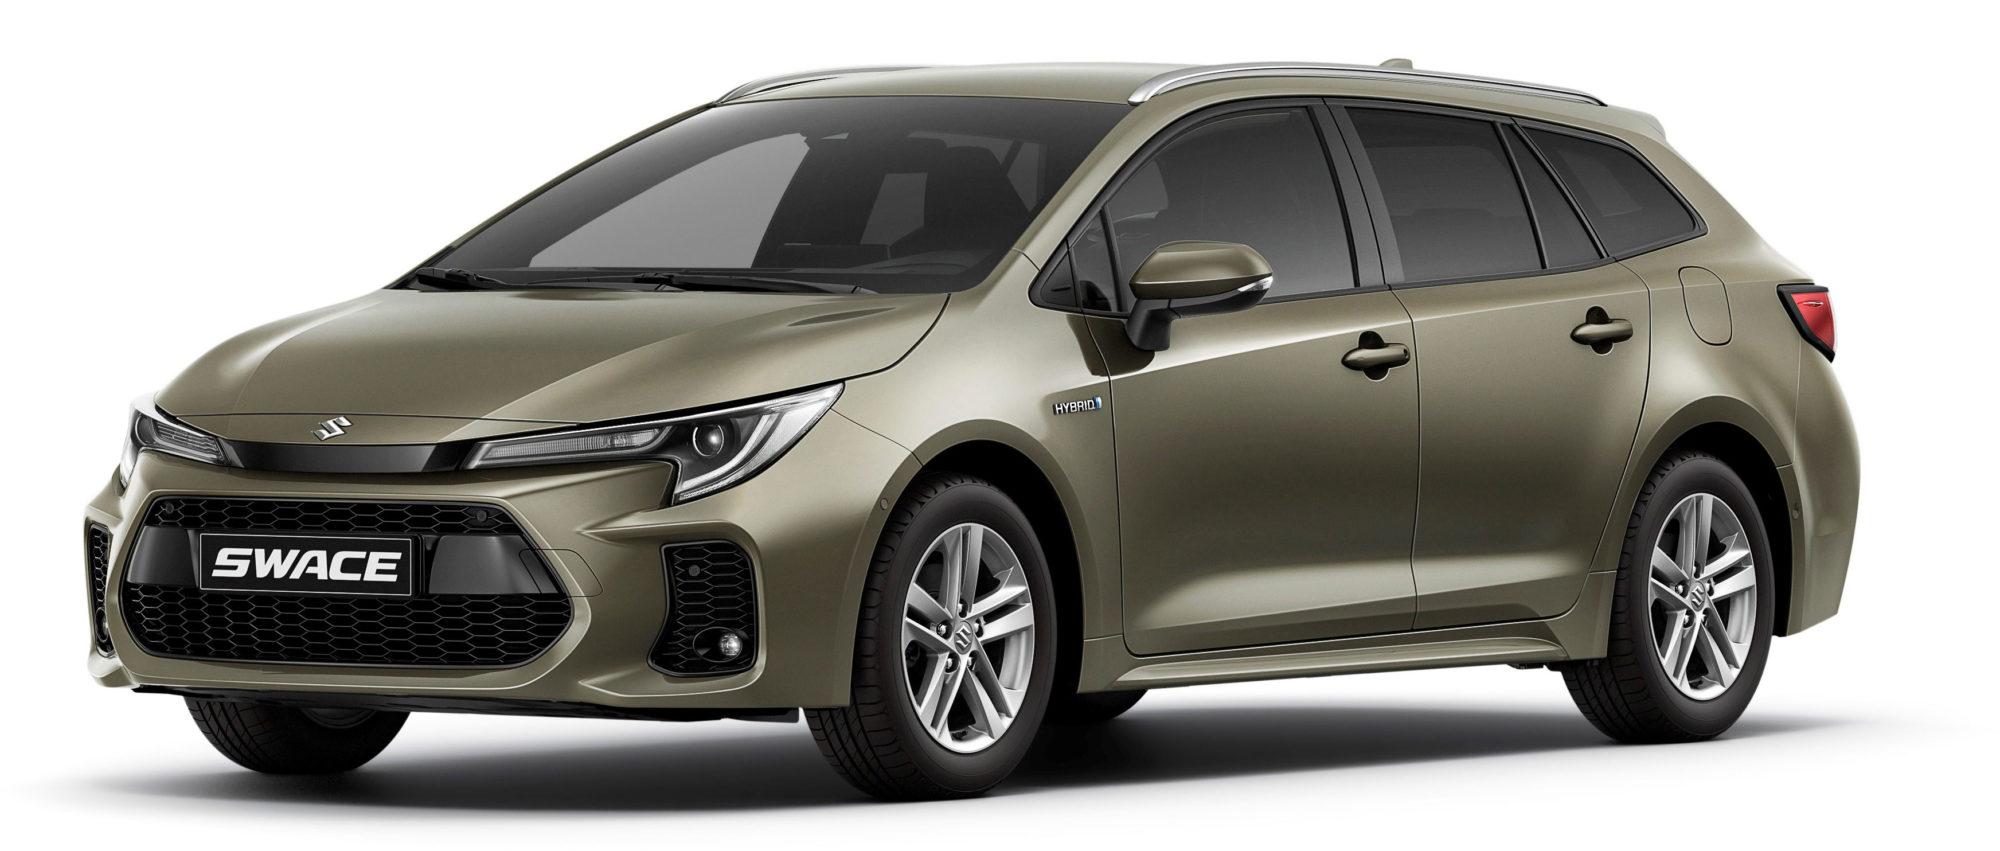 Suzuki Swace 2020 - Oxide Bronze Metallic